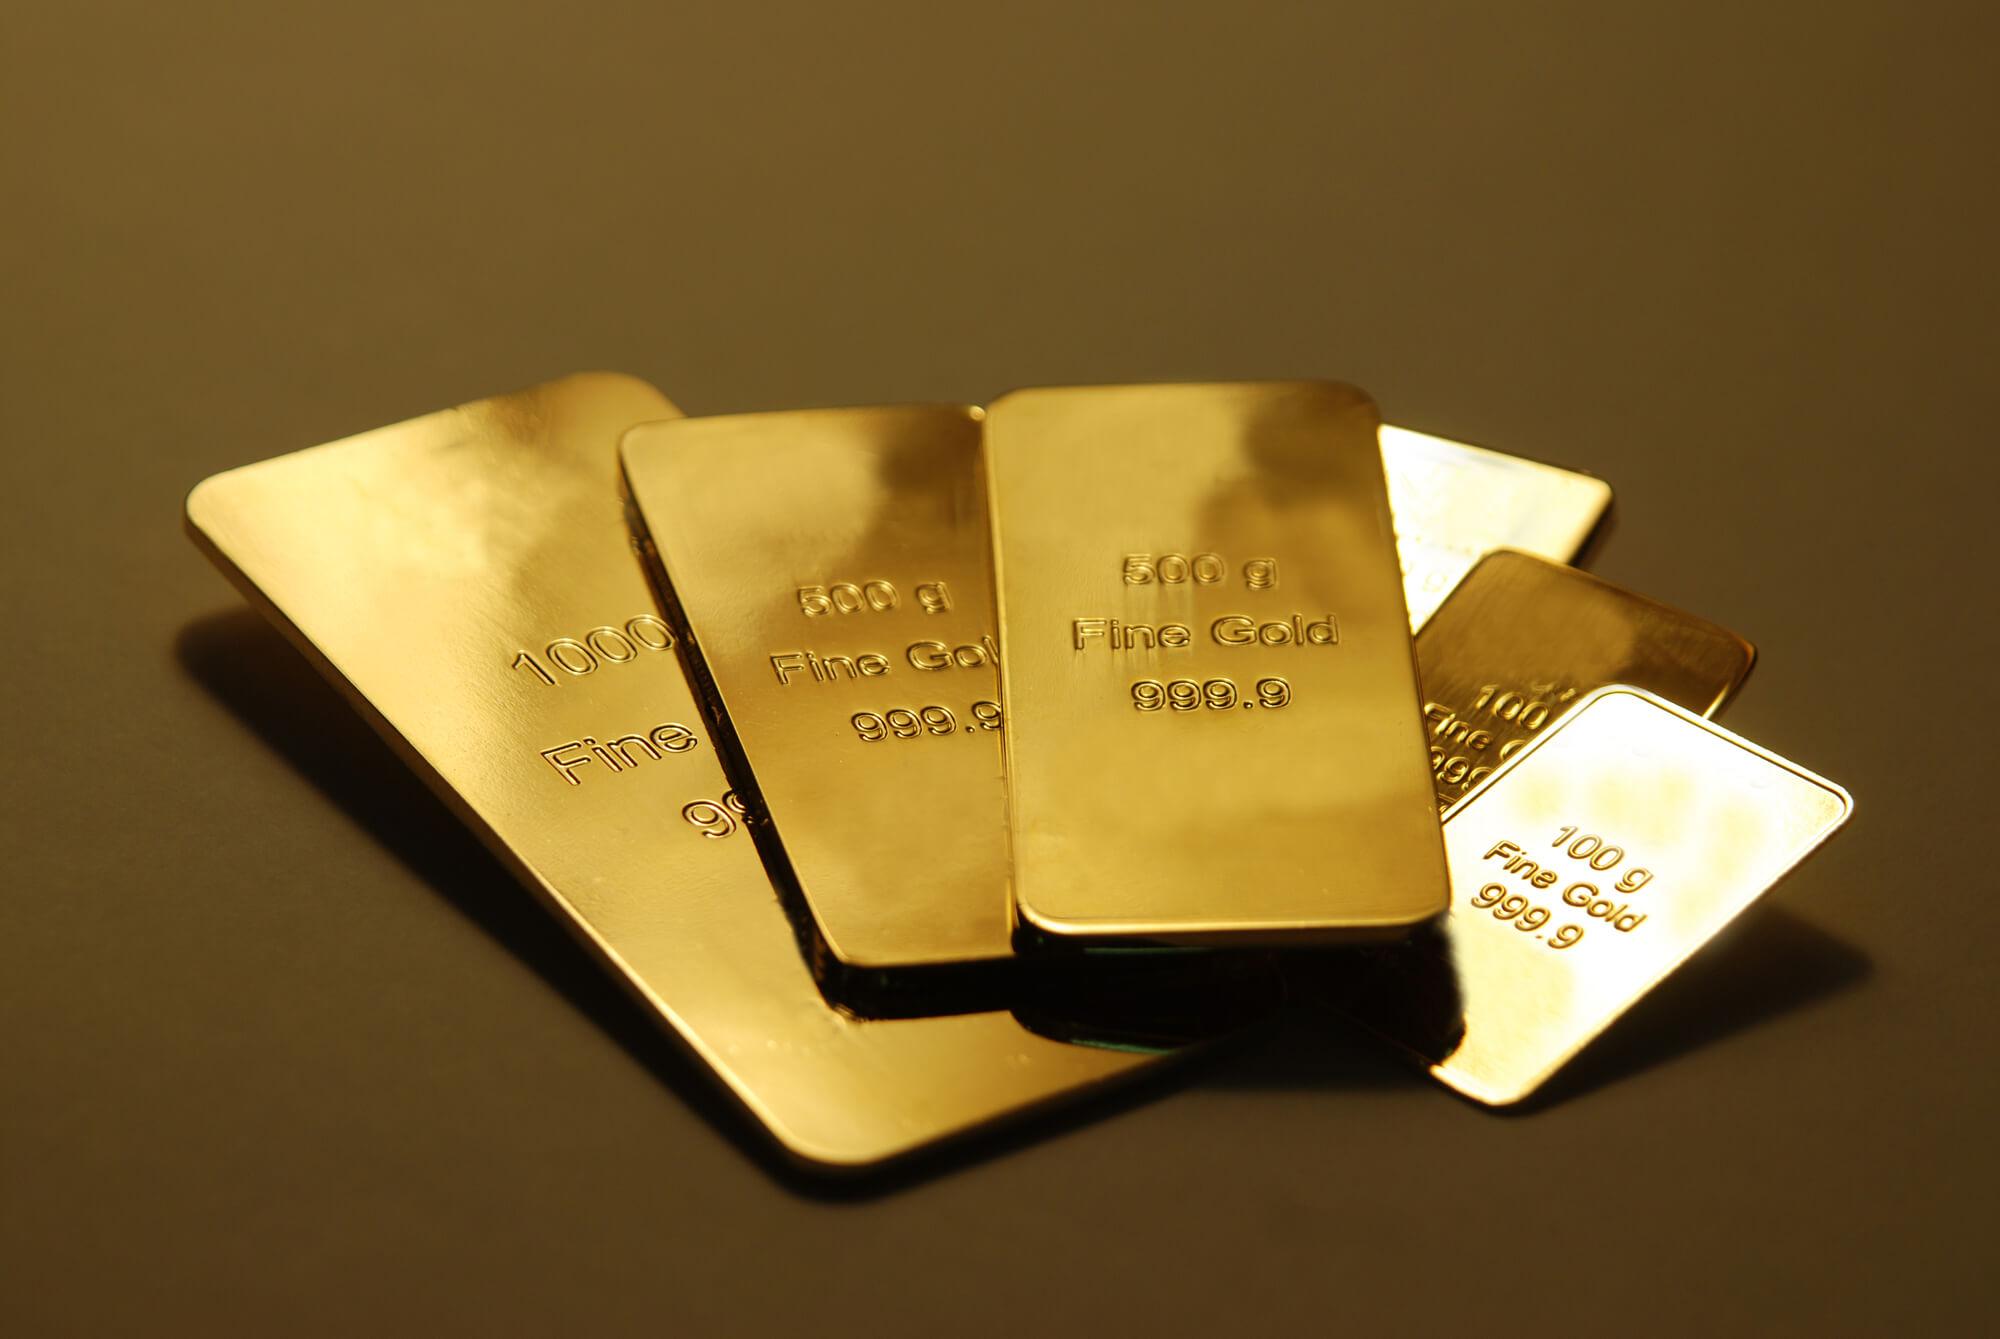 where can i get precious metals in west palm beach?